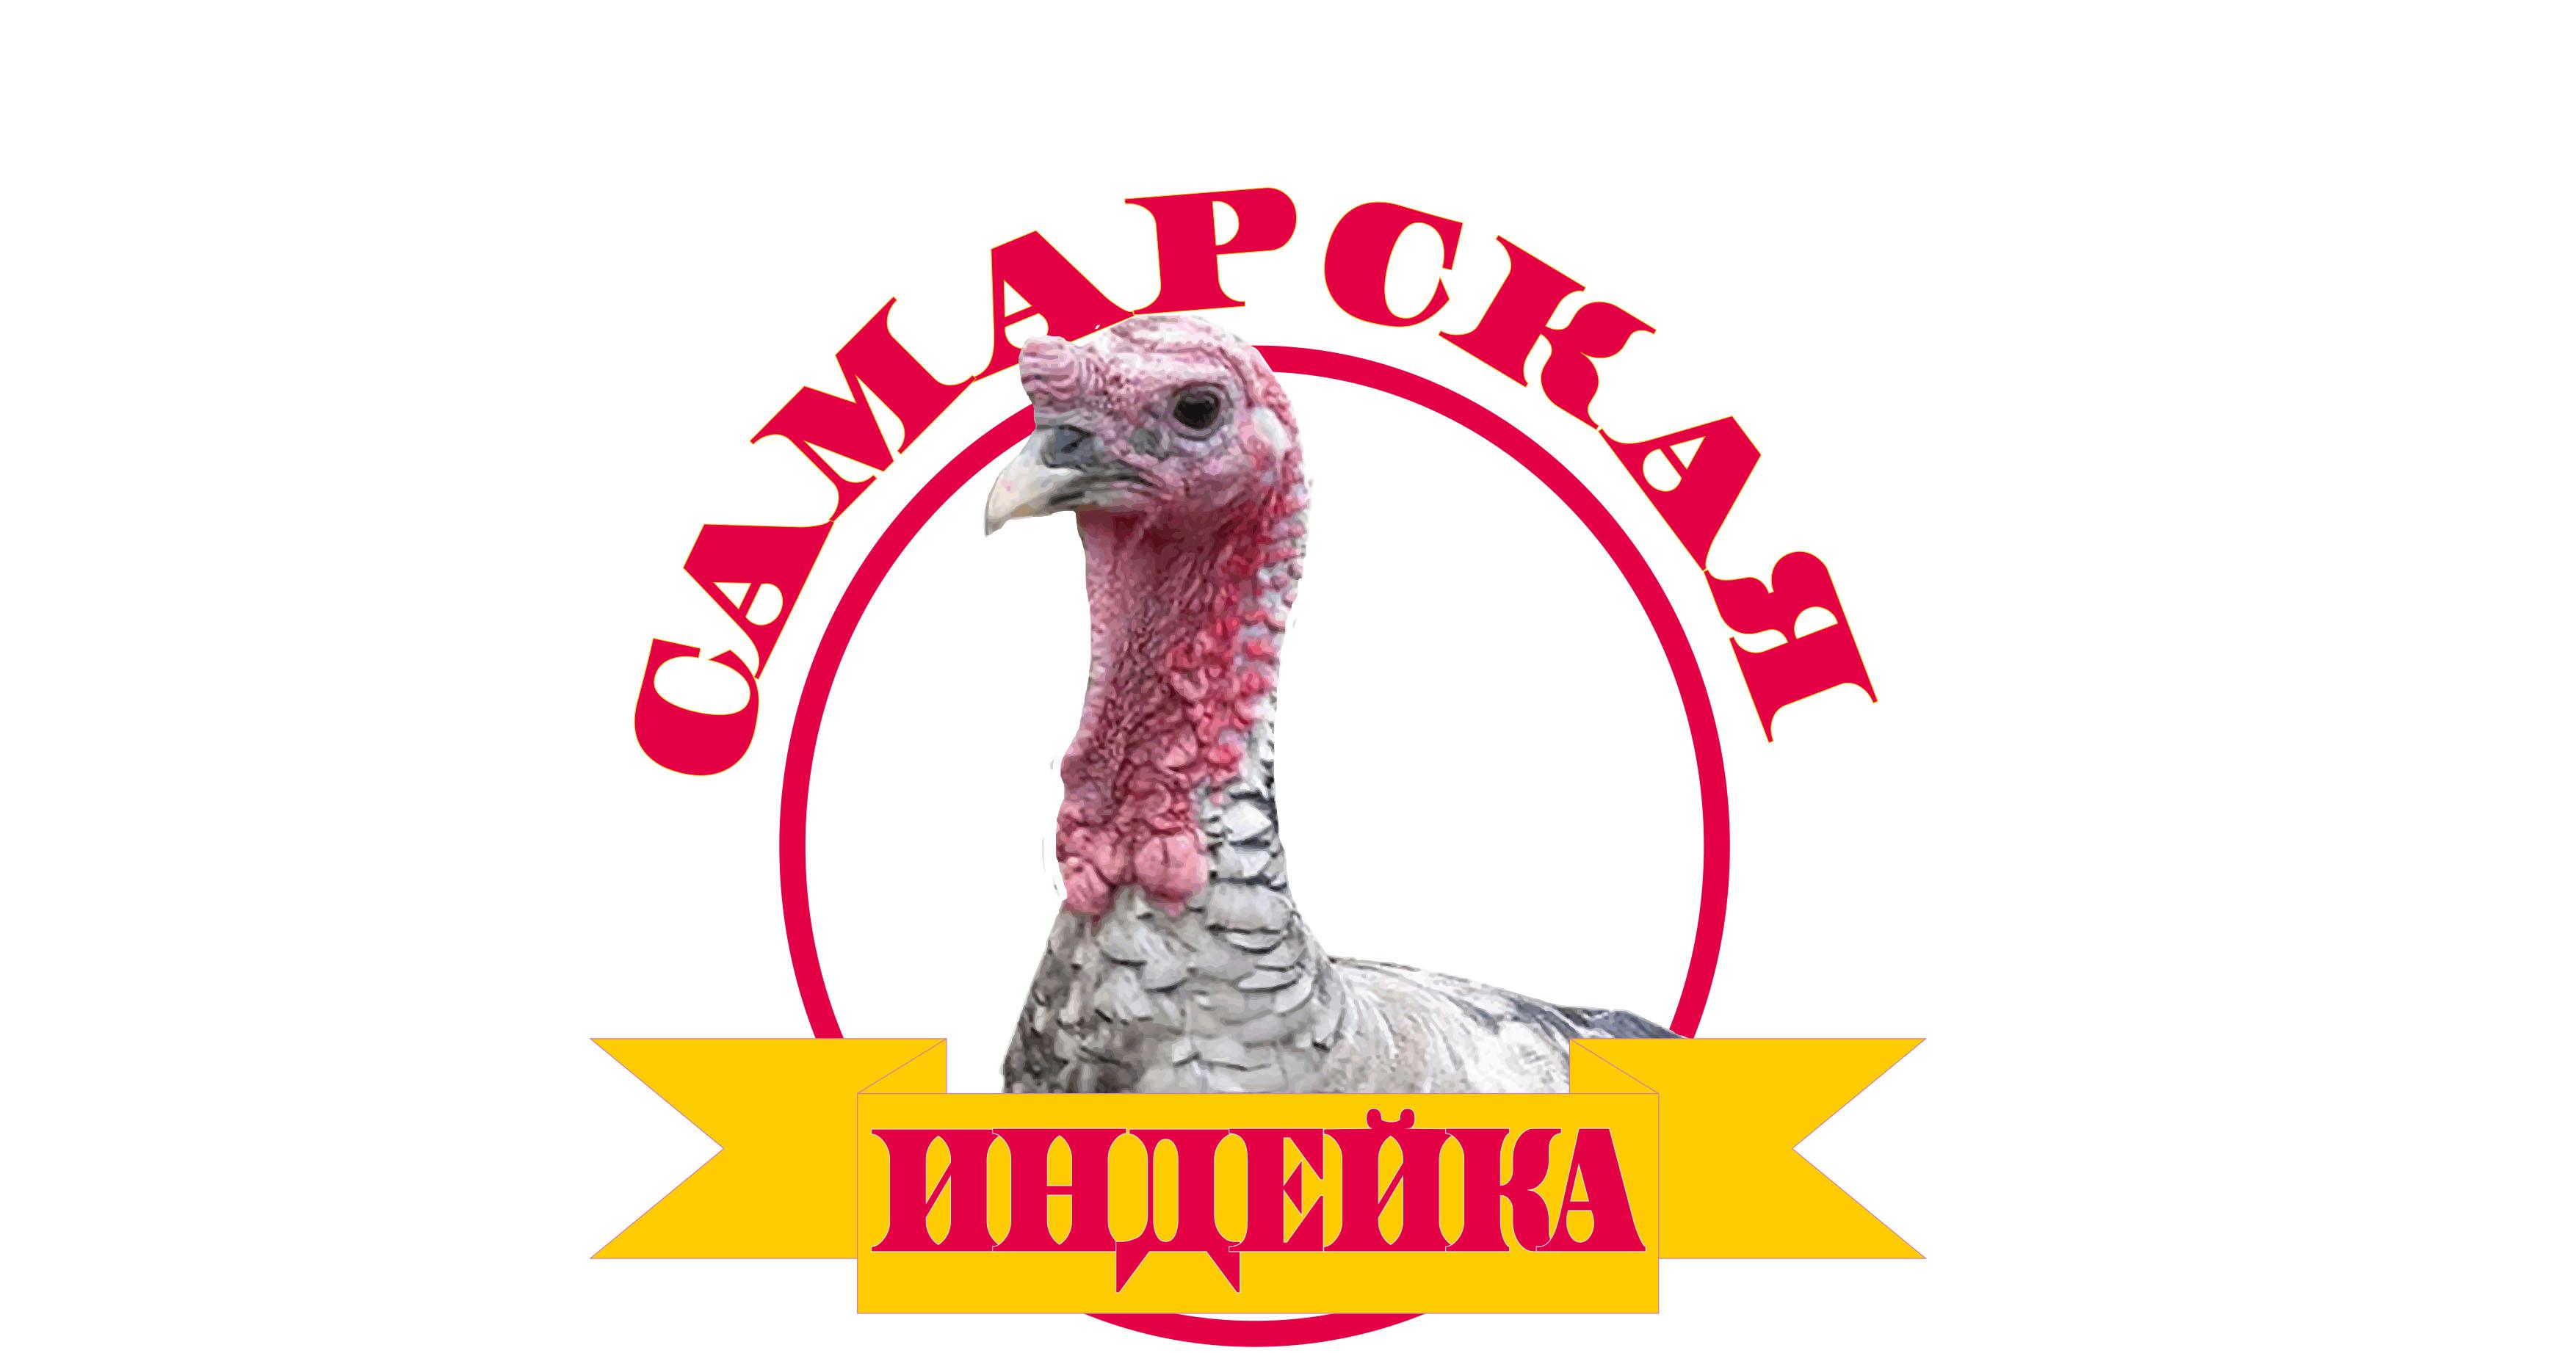 Создание логотипа Сельхоз производителя фото f_24655e3060178a28.jpg